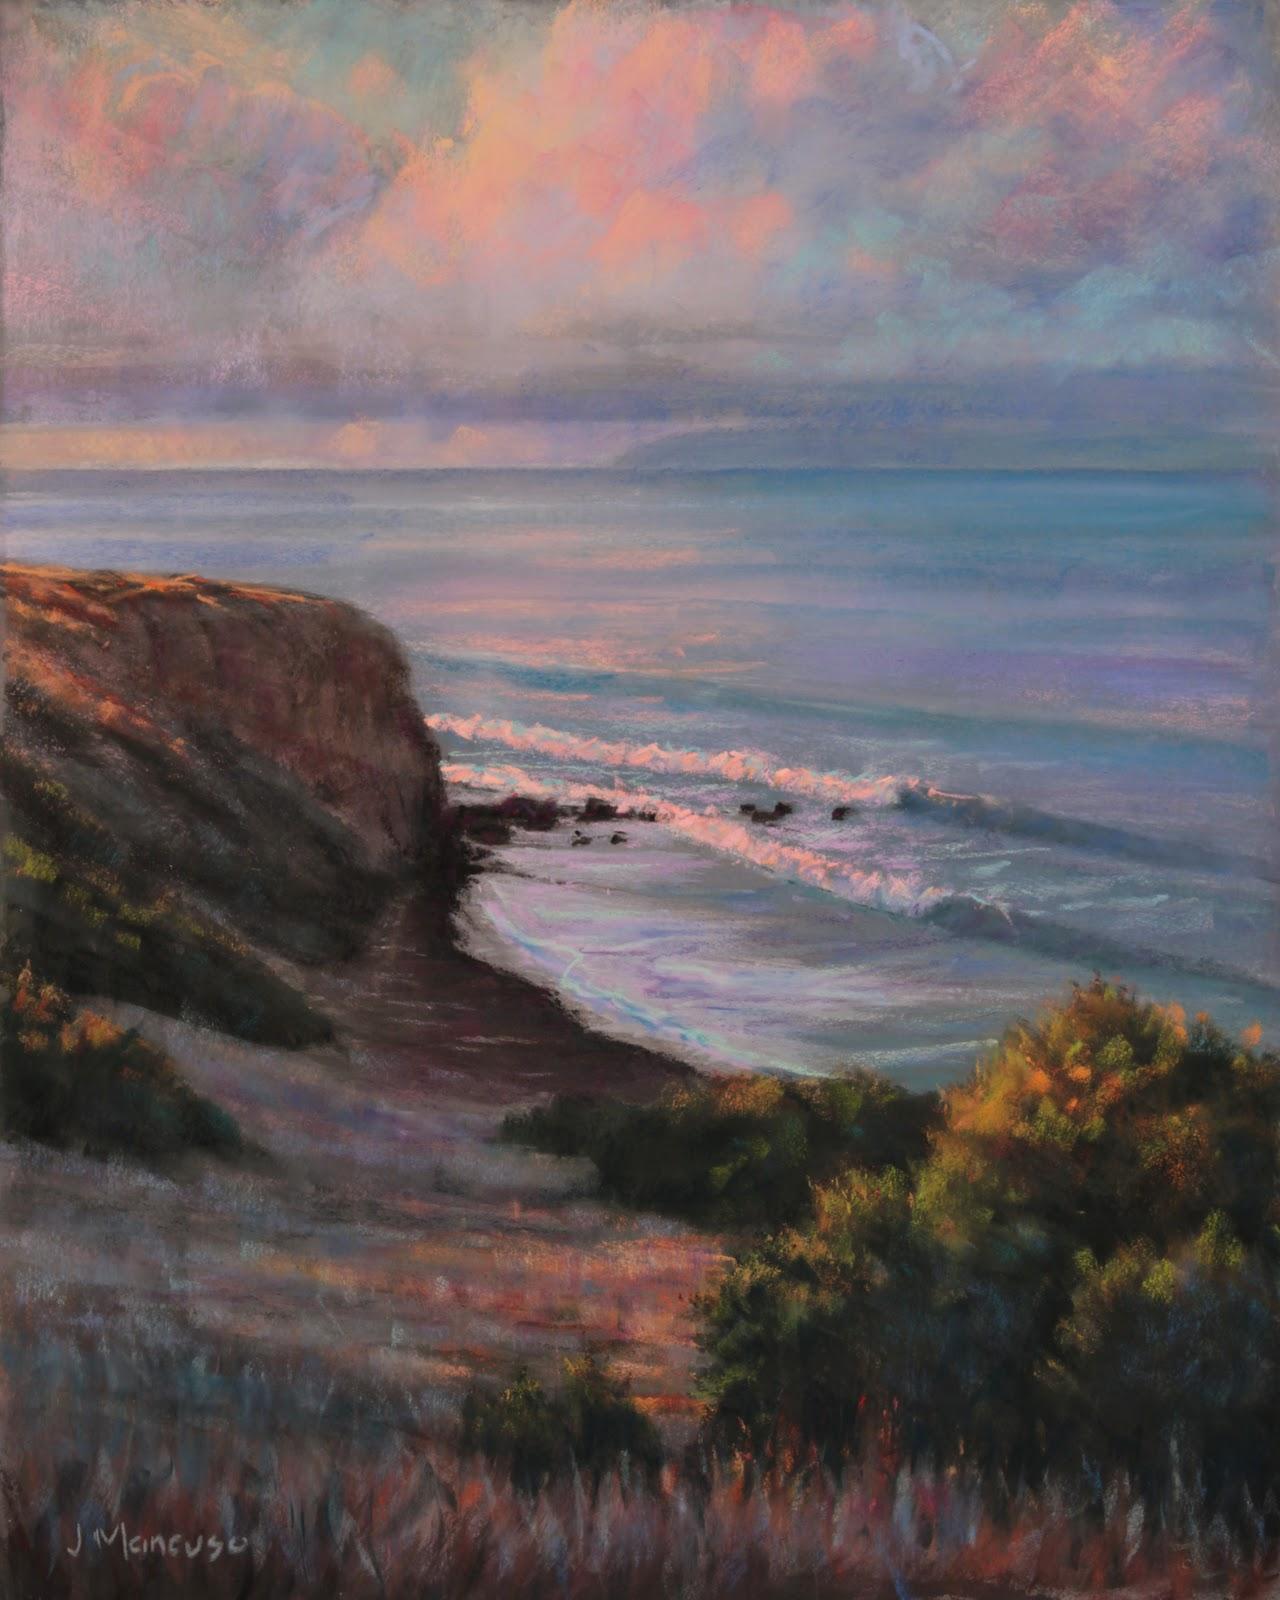 paintings by joe mancuso portuguese bend palos verdes 20x16